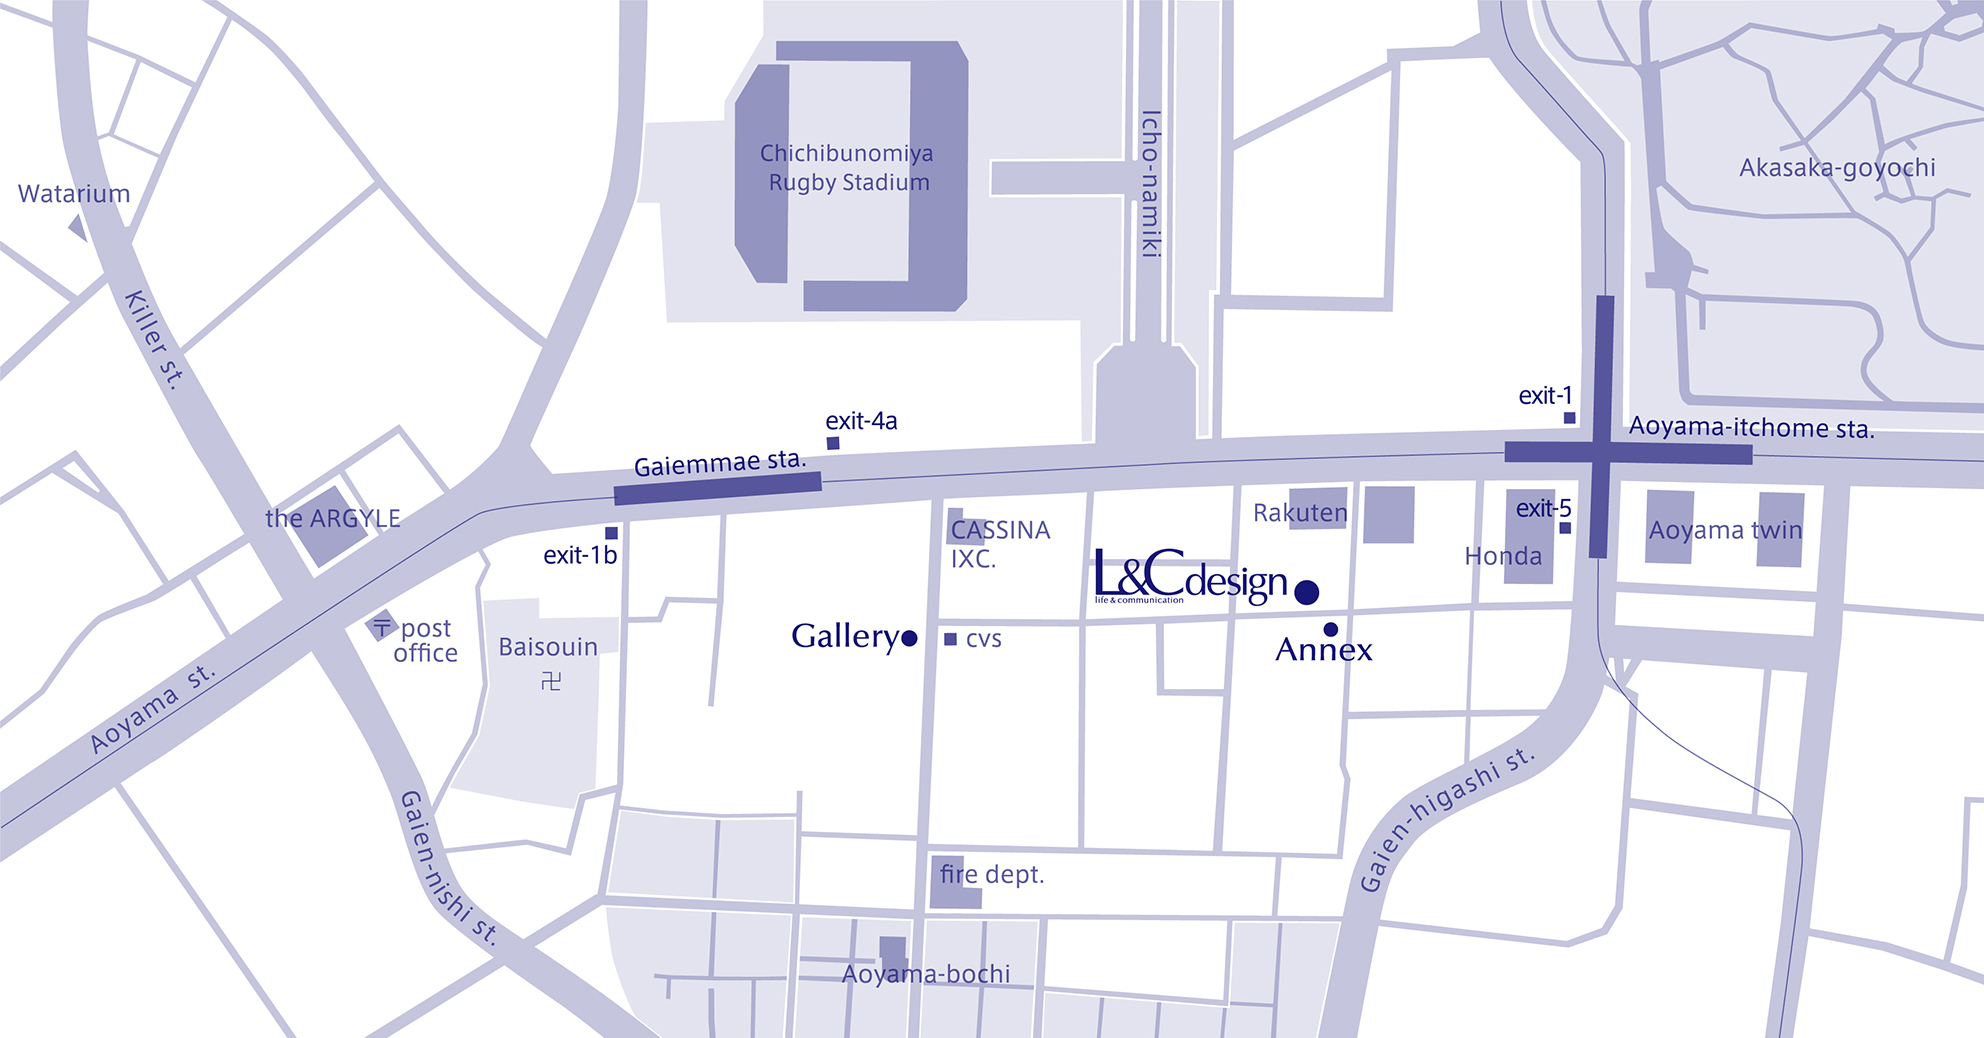 L&C design Access Map